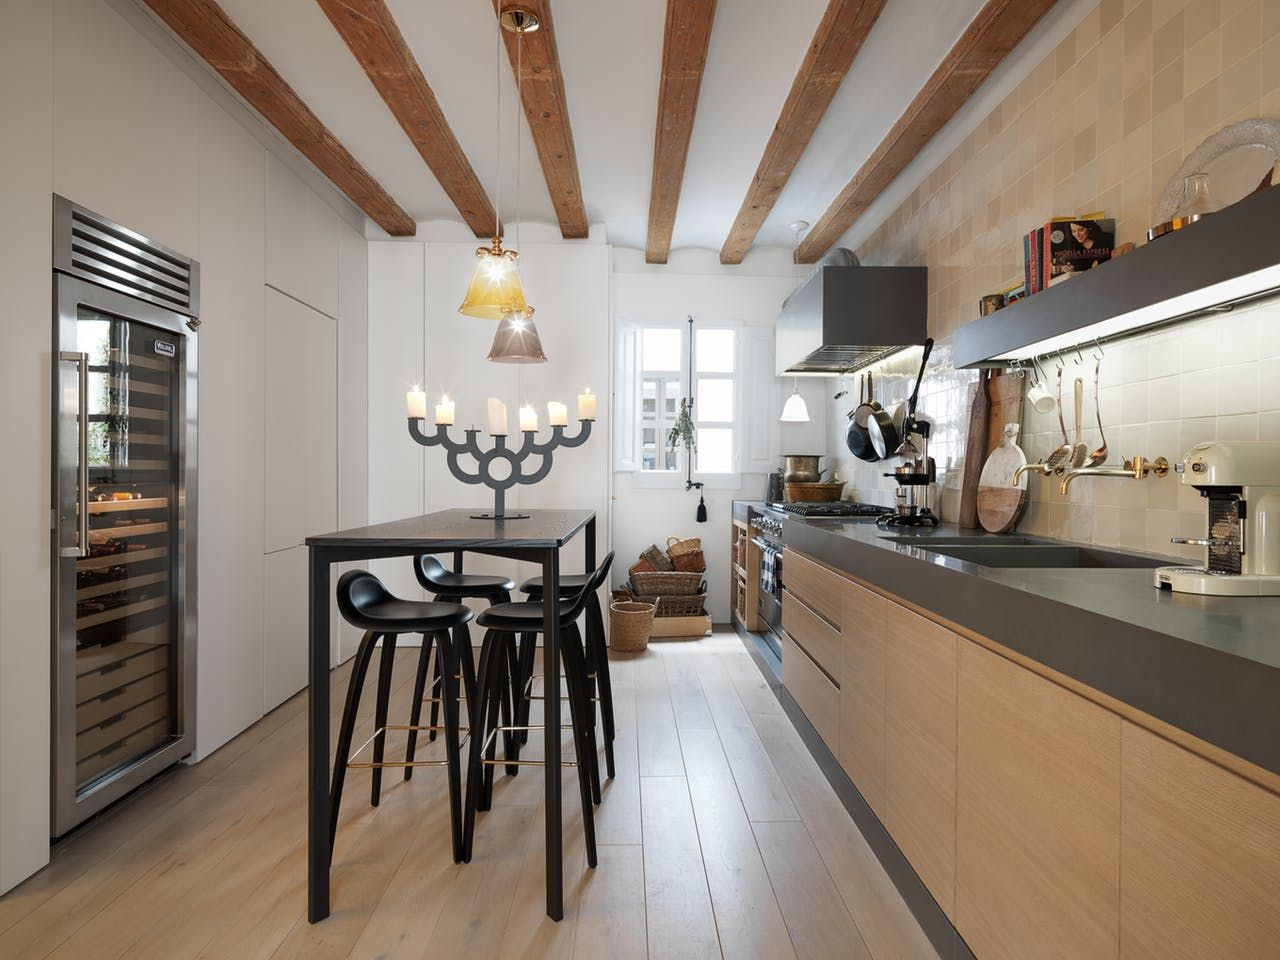 The barcelona home of minotti london s creative director natural